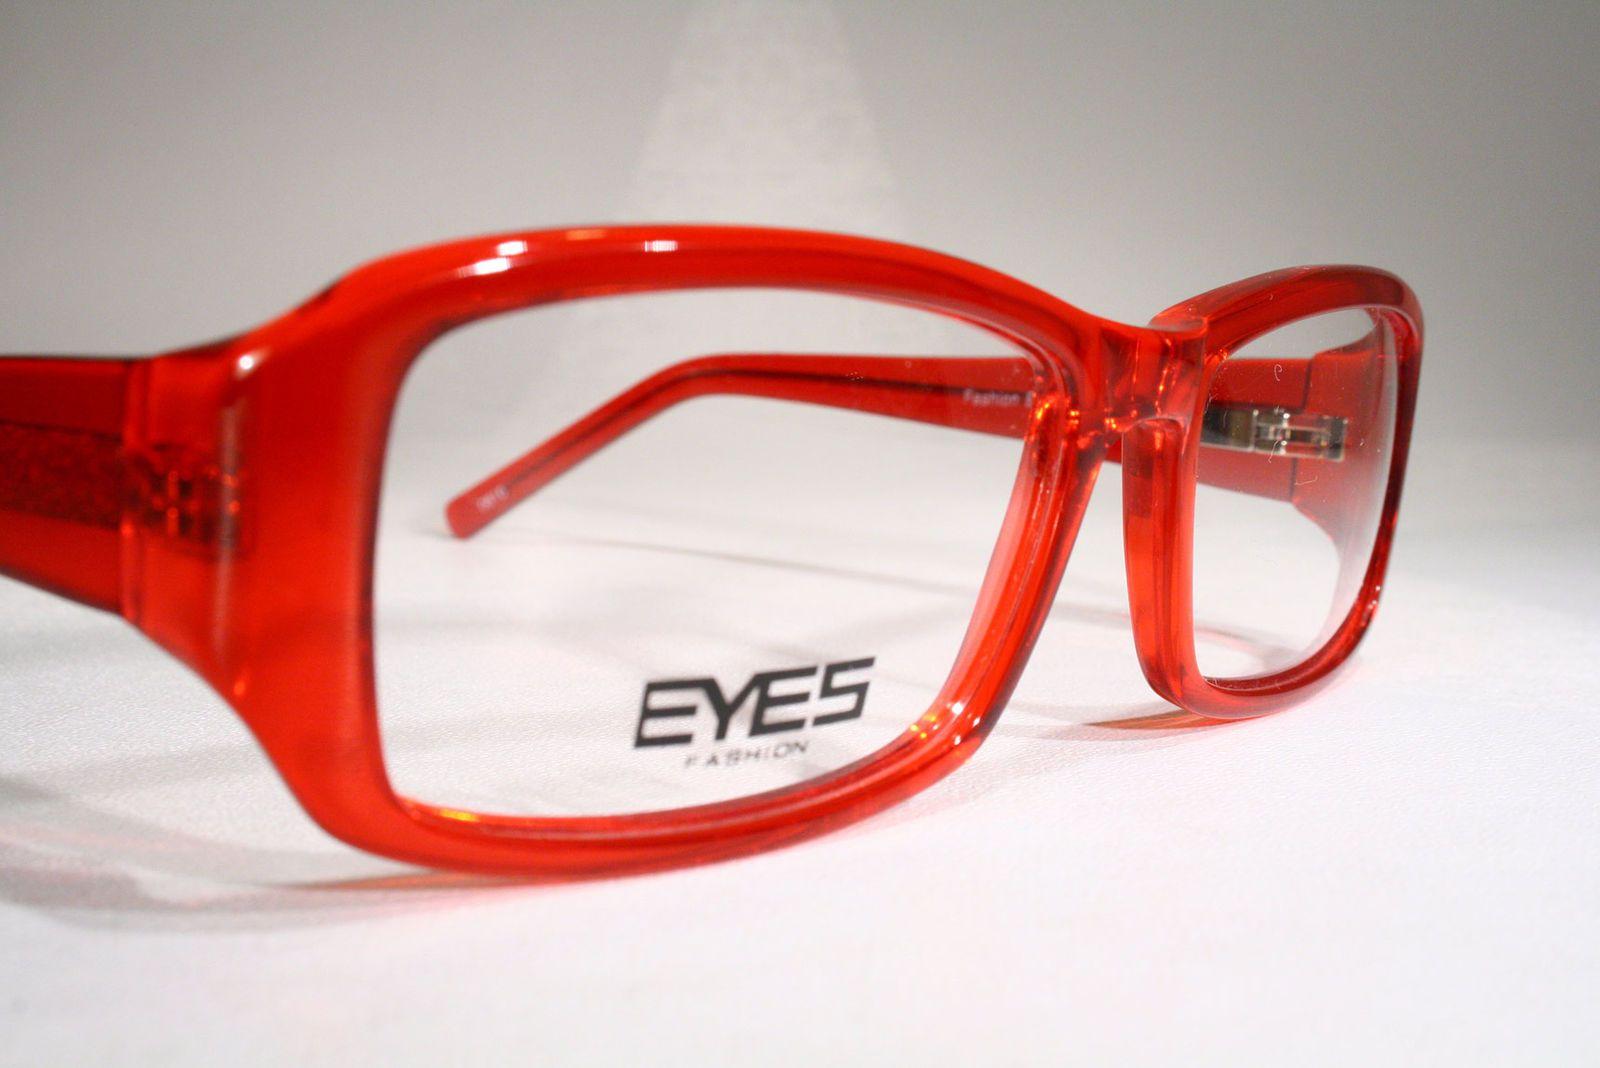 4541bc07b3c Women s FASHION EYES Clear Transparent Cherry Red Eyeglasses Optical Frames  Glasses Large   eBay (RipVanW)